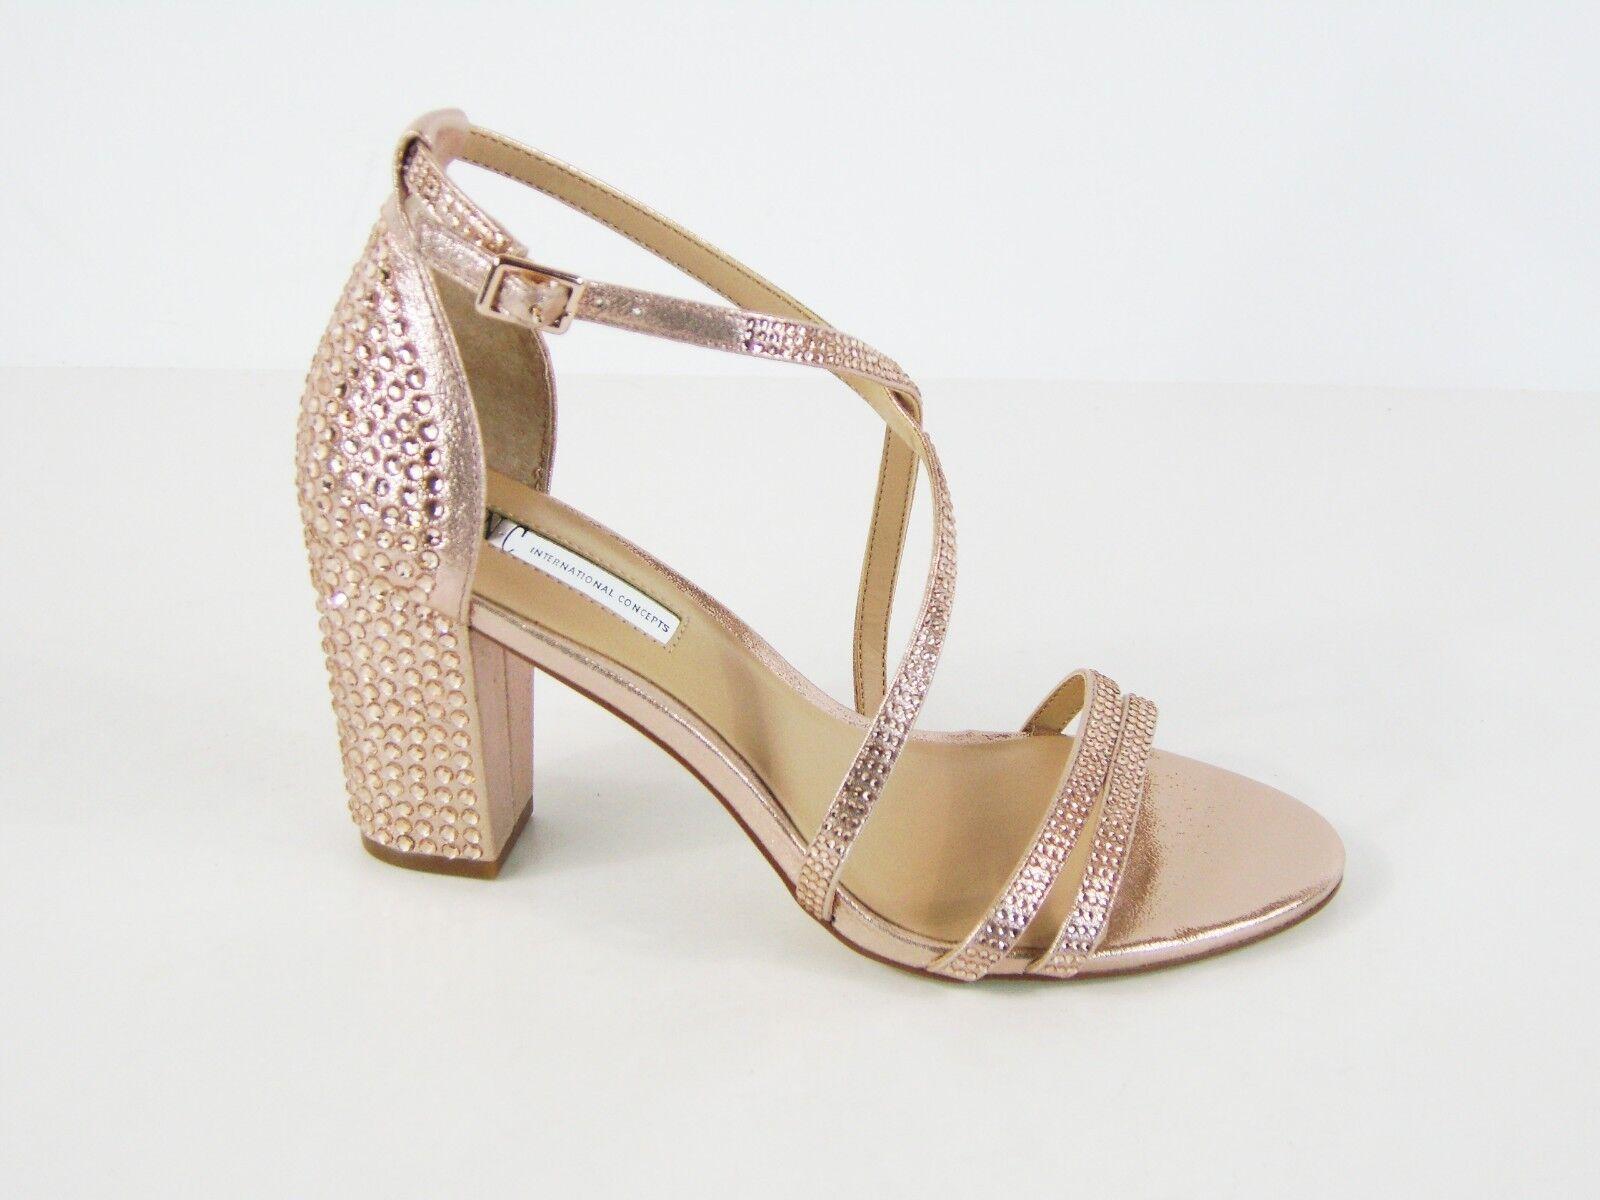 INC International Concepts Kamma Strappy Dress Sandale - Rose Pearl - Sz 7 M